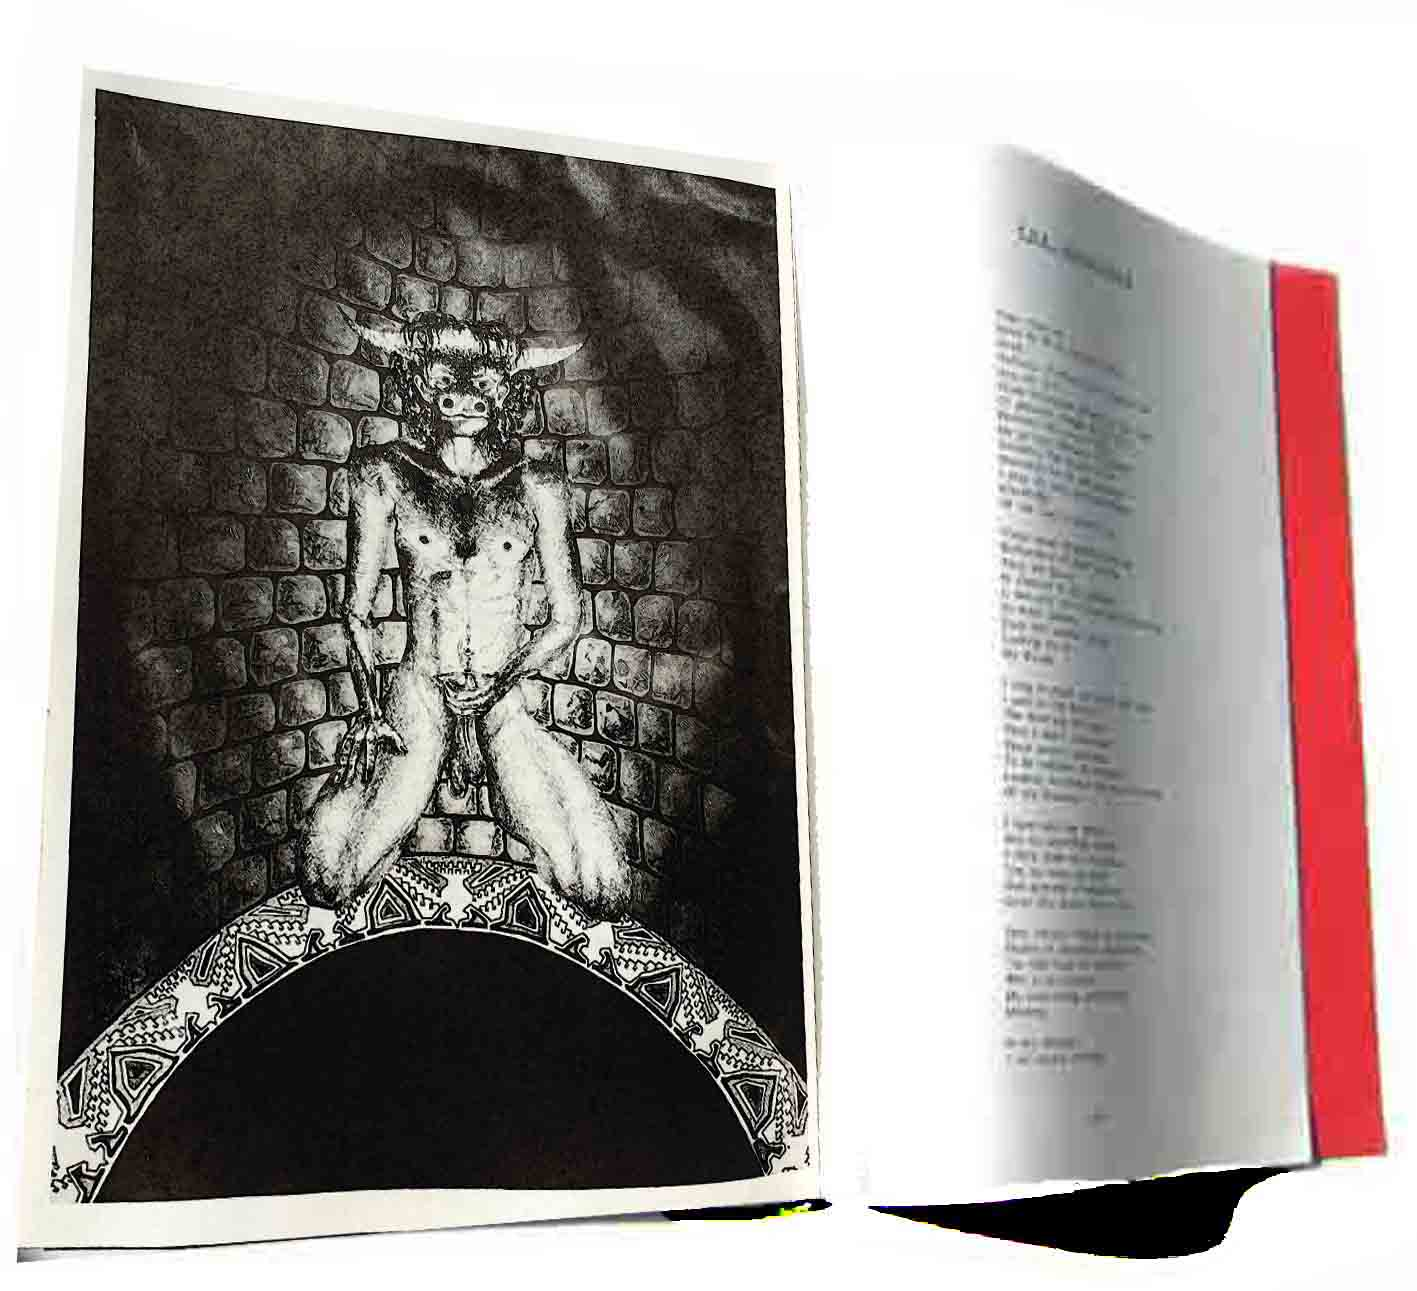 Minotaur Alastair Campbell Starfire Vol I, No.1 April 1986 Typhonian Ordo Templi Orientis Poem Ann Campbell